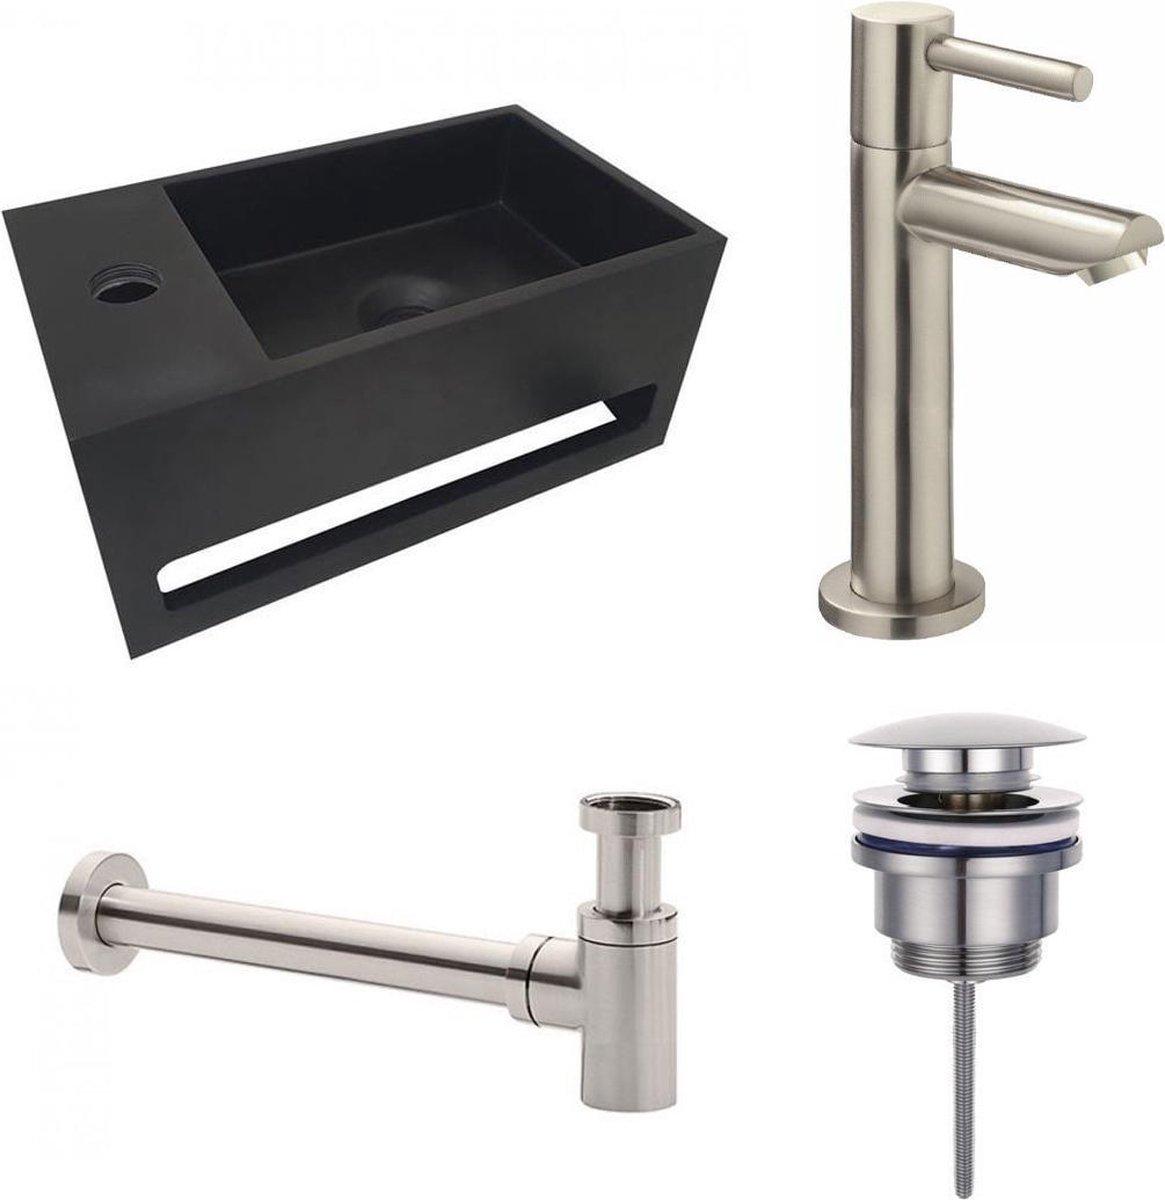 Fonteinset S.S. Solid Surface Mat Zwart Links 35.6x20.3x15.9cm Toiletkraan Hendel Clickwaste Sifon Geborsteld RVS